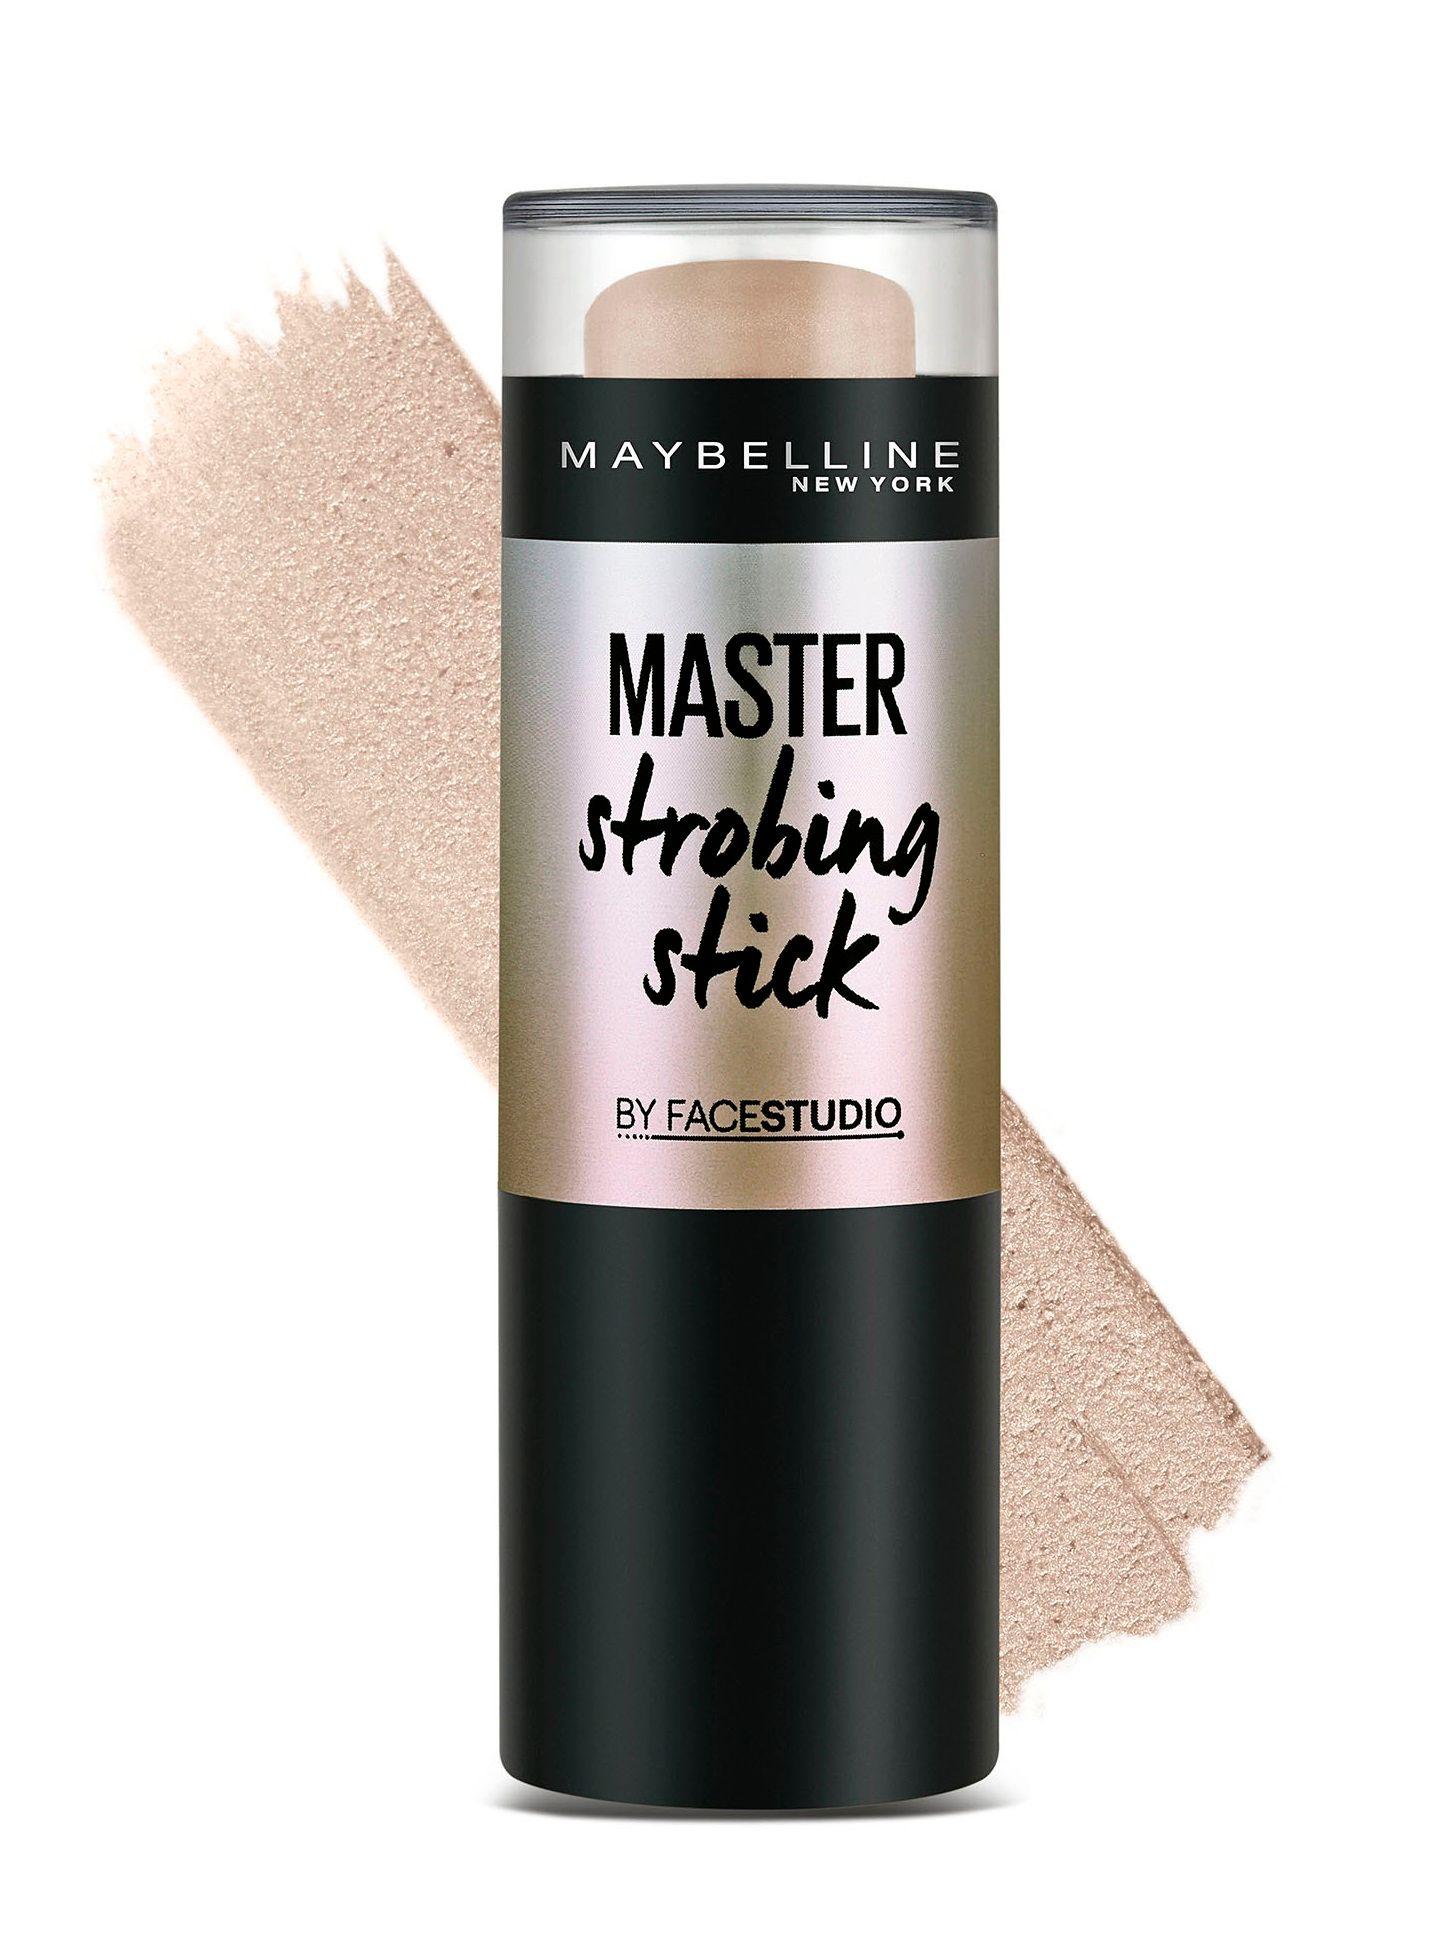 Maybelline New York Facestudio Master Strobing Stick - Nude